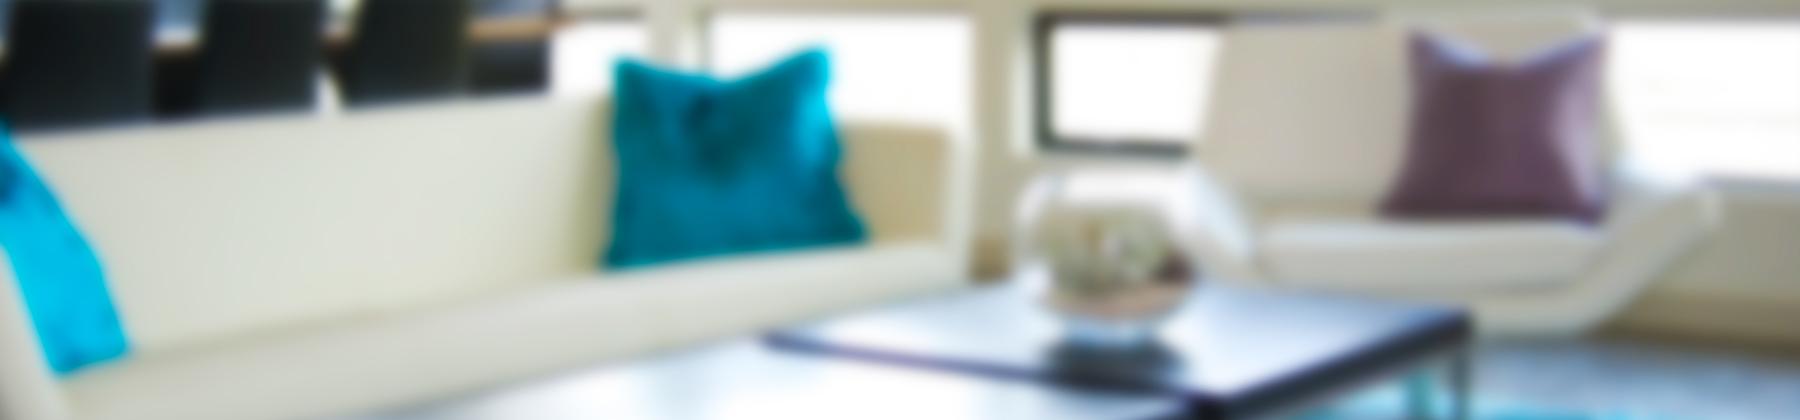 furnishing-banner-bg